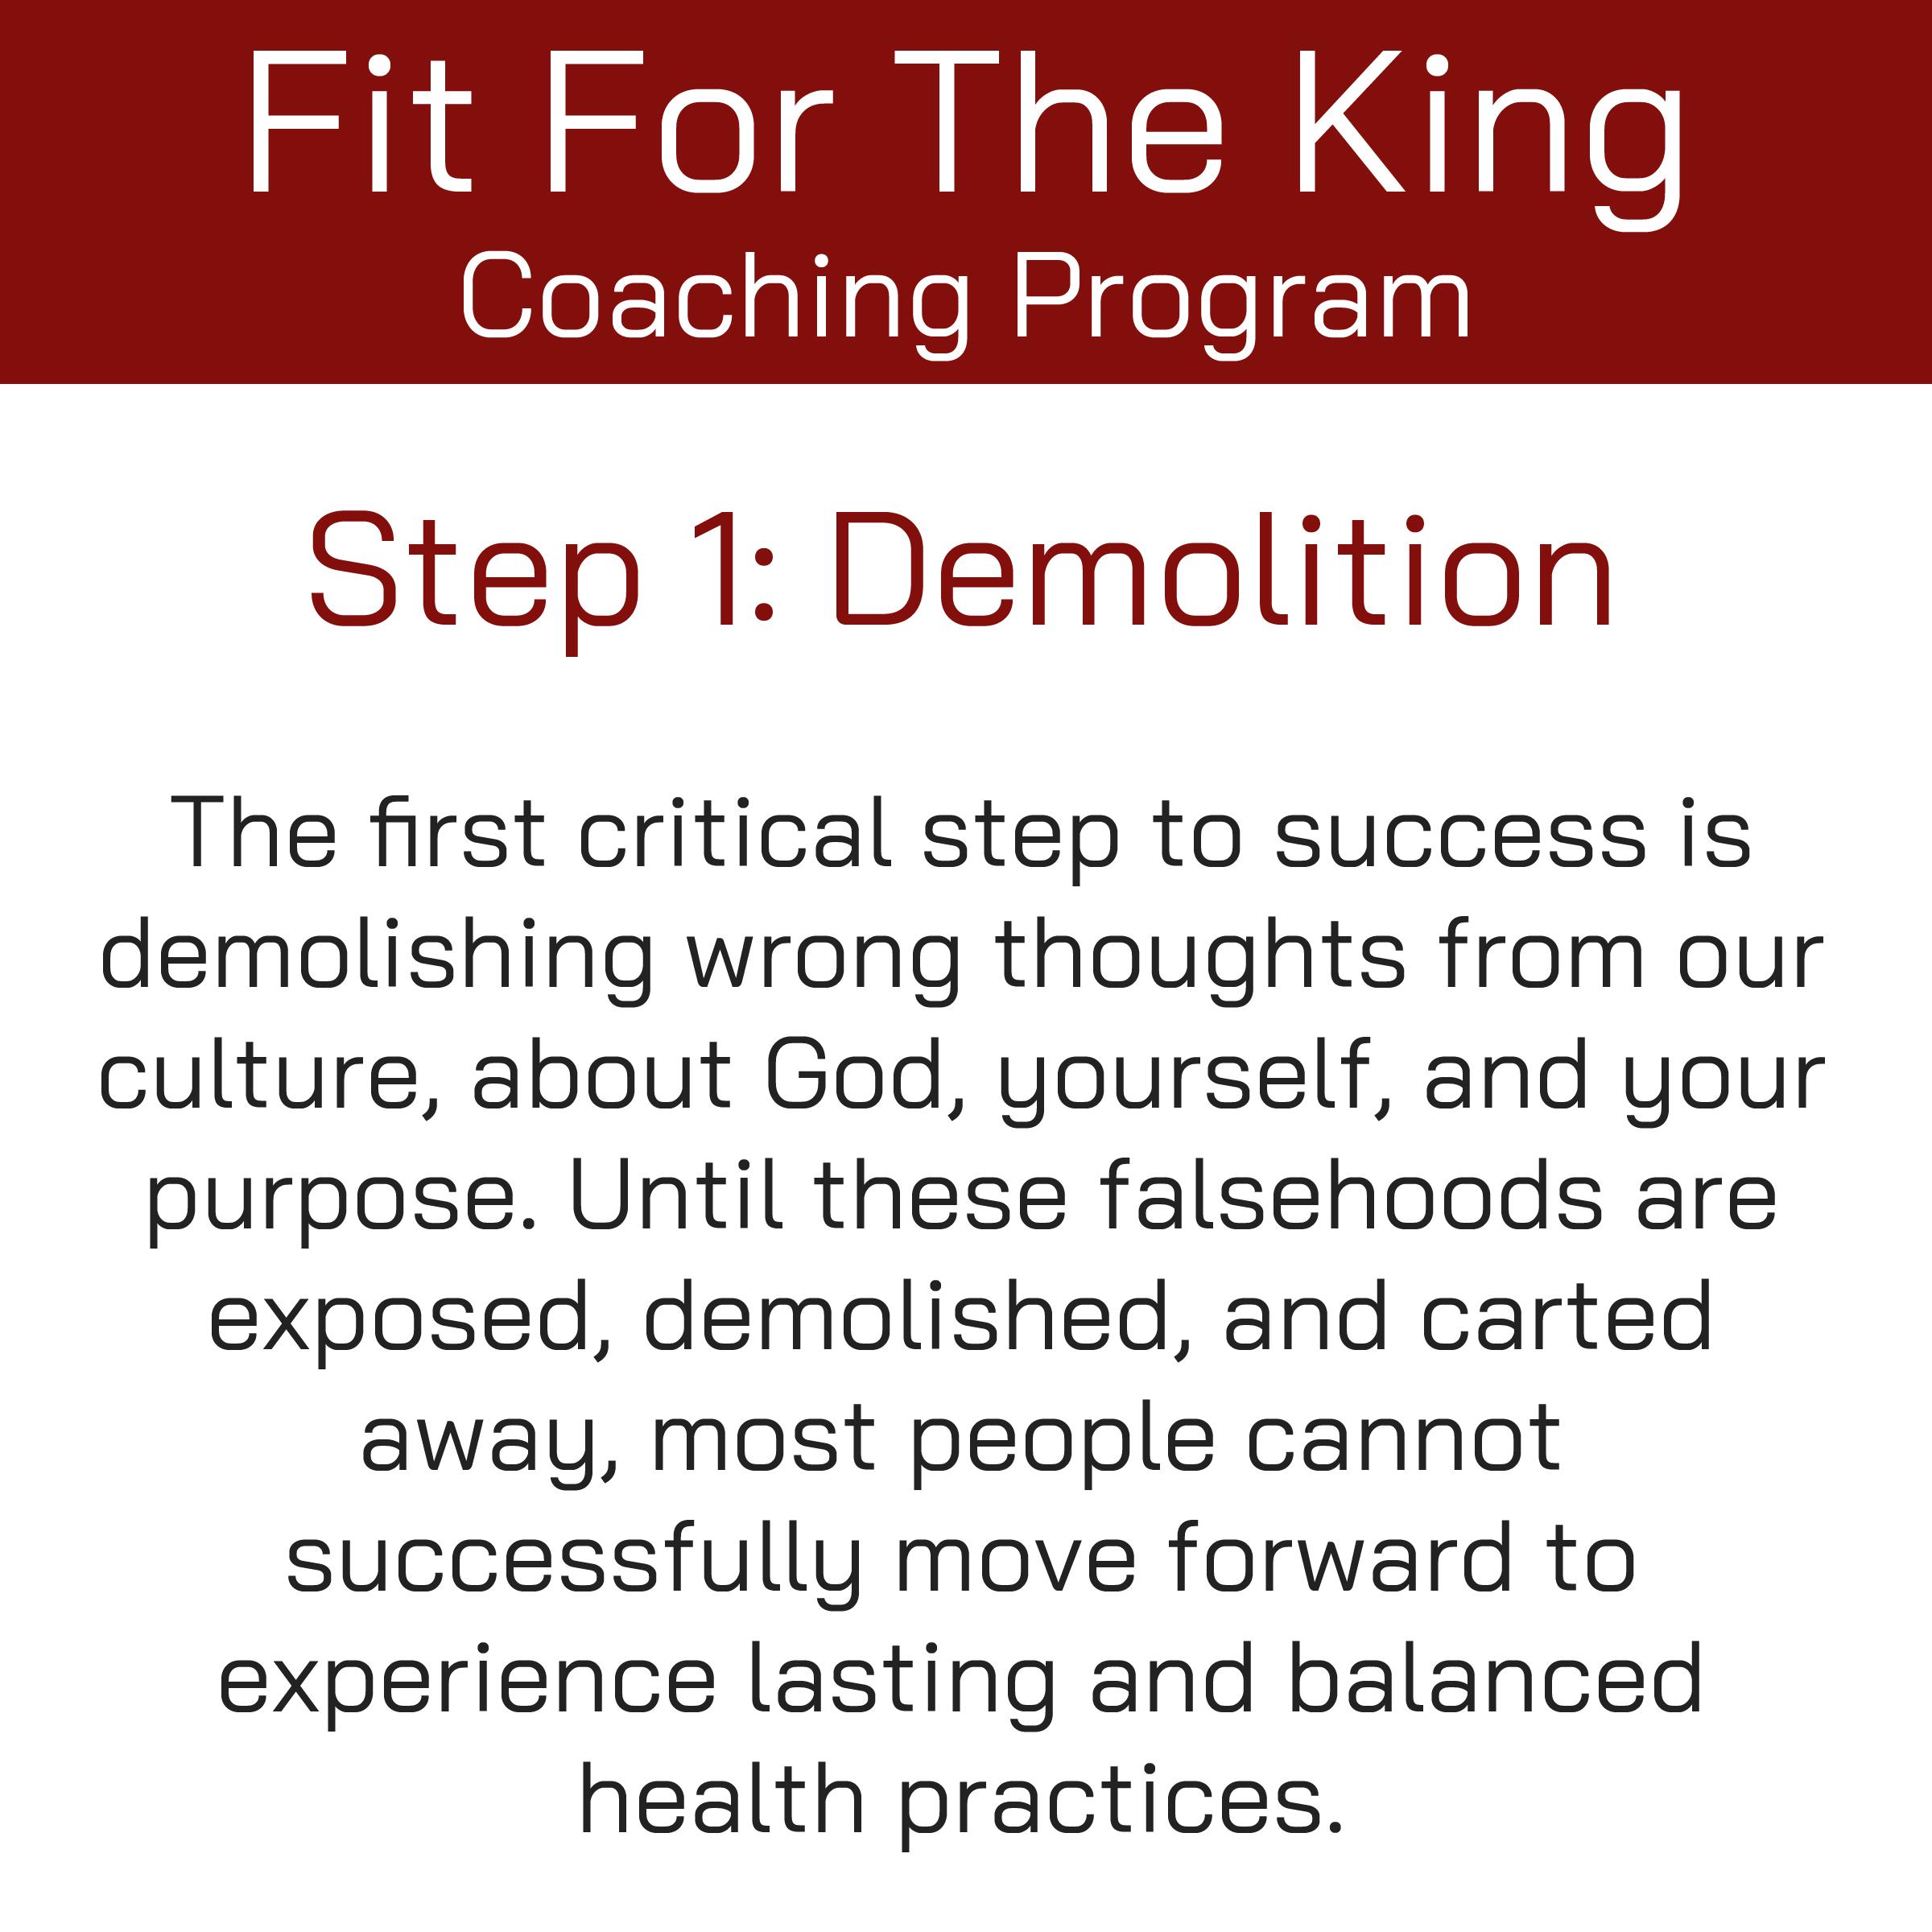 FFTK Coaching Program - Demolition